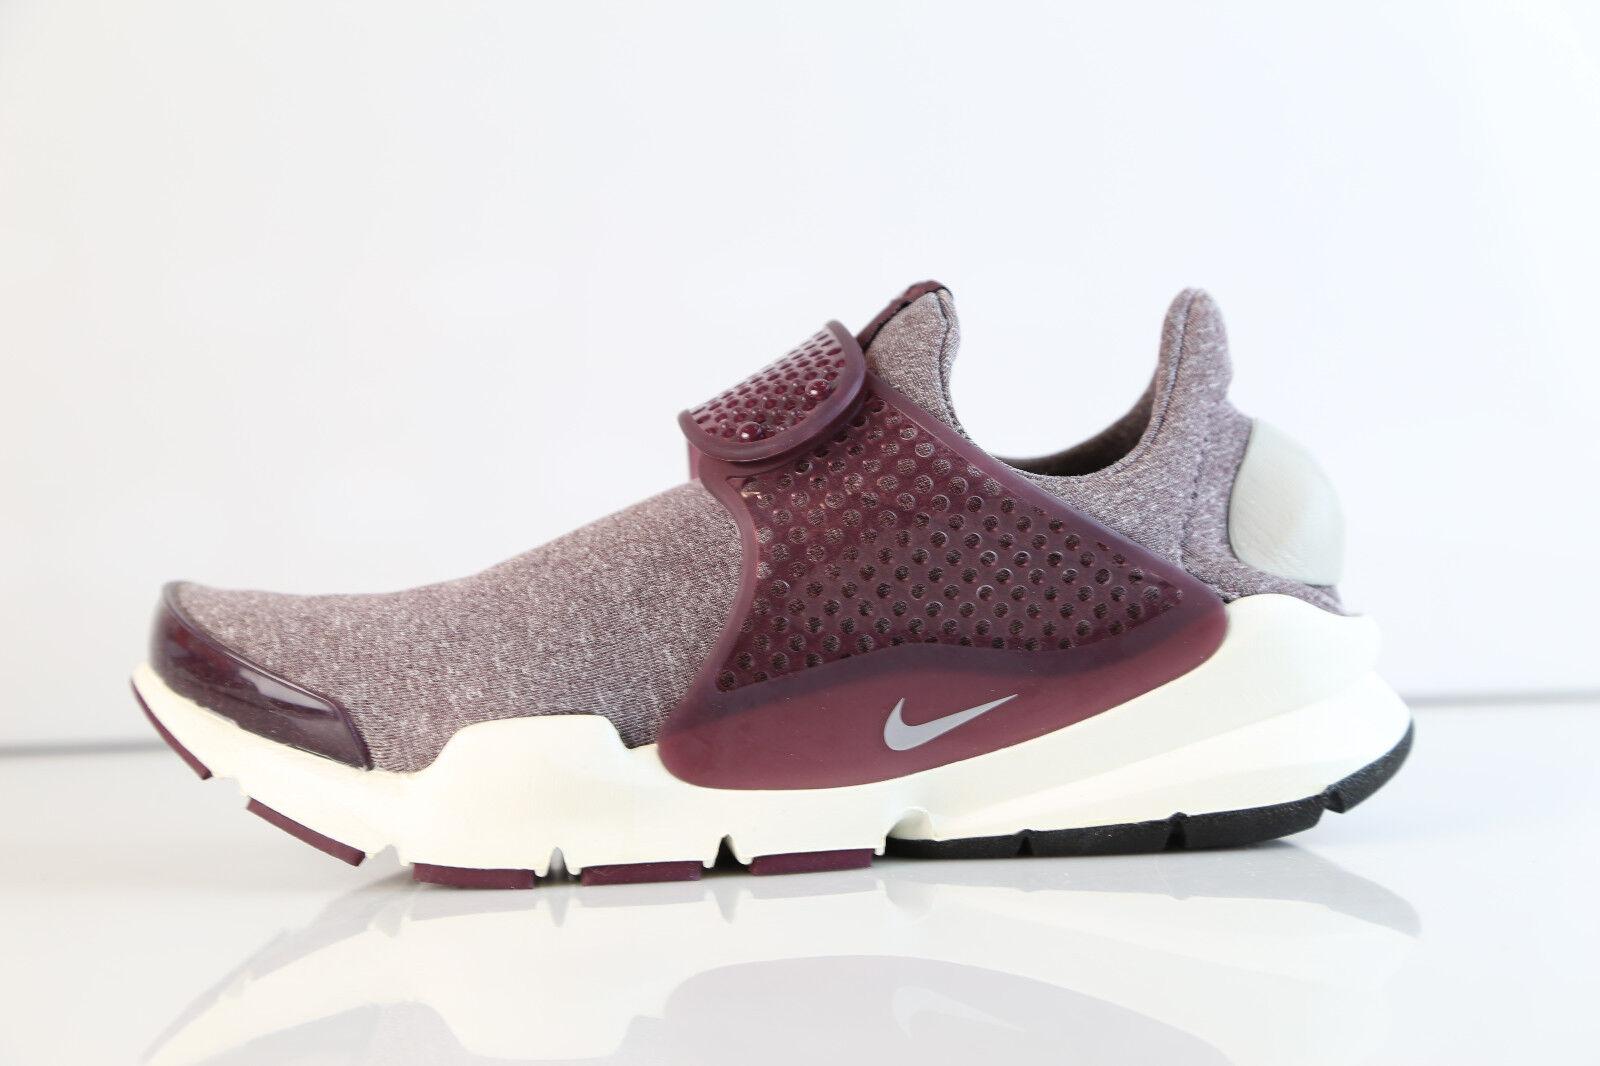 Nike Womens Sock Dart SE Night Maroon Iron Ore 862412-600 5-12 bordeaux prm free